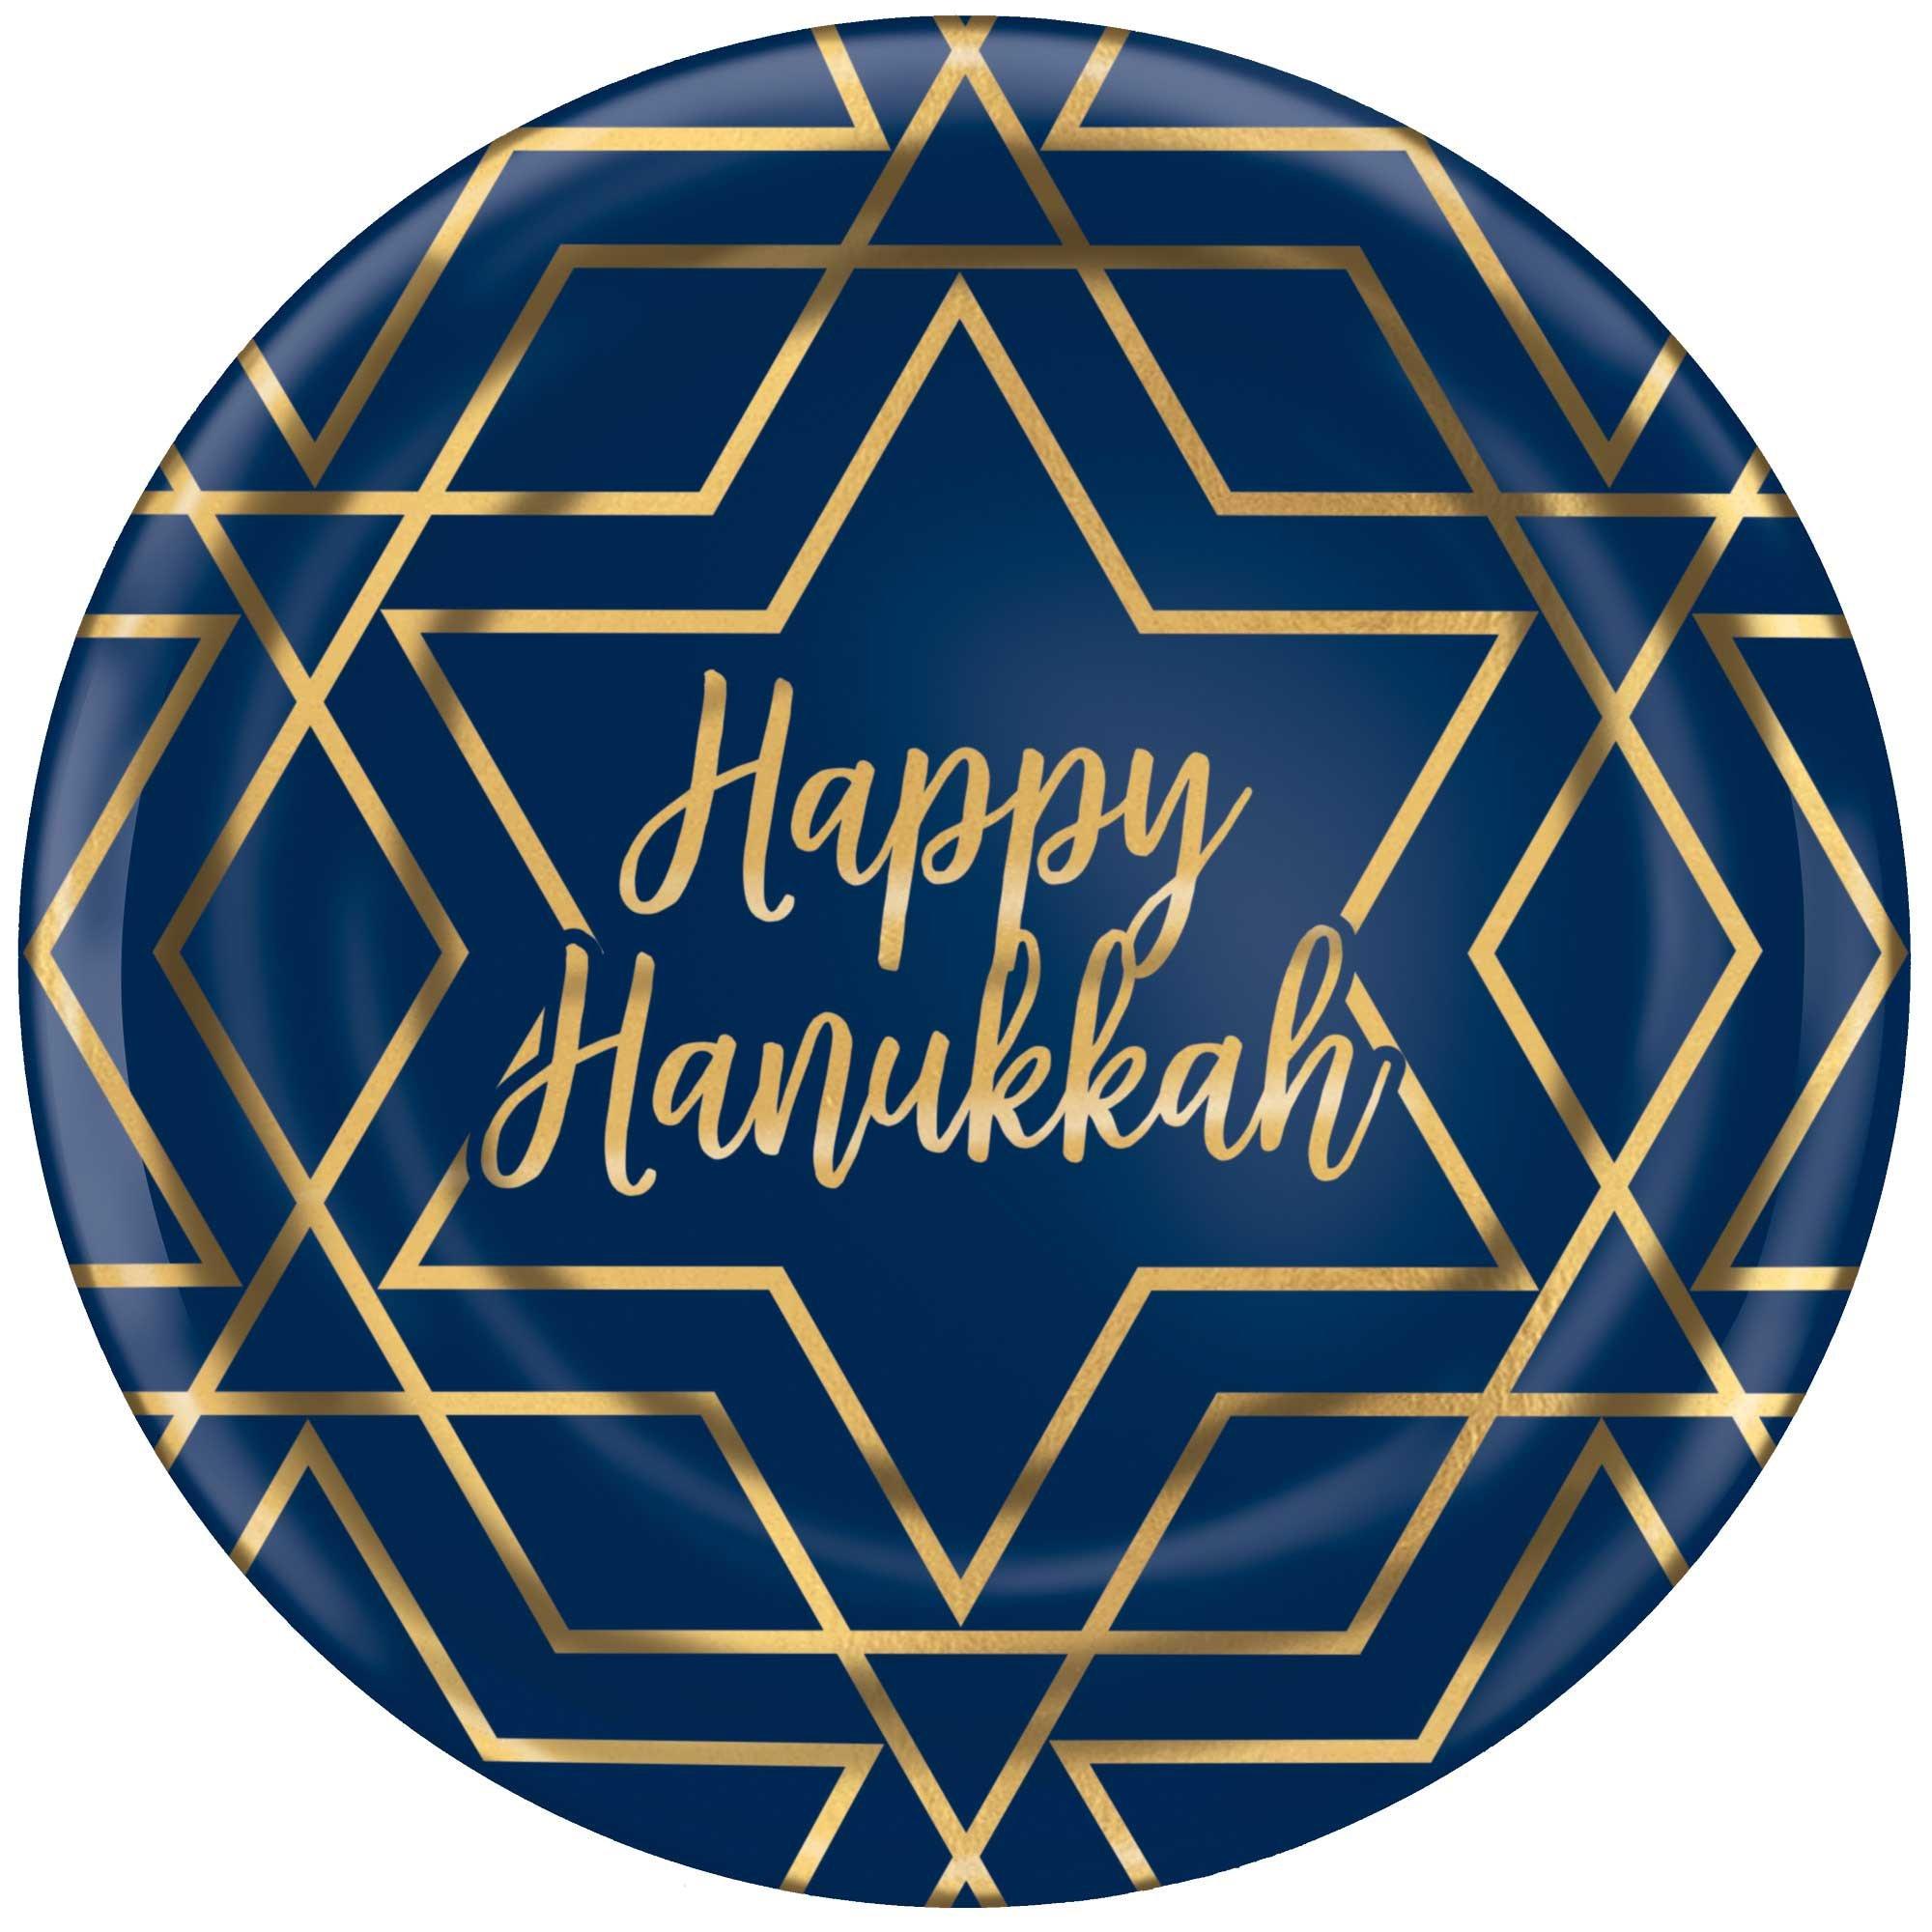 """Hanukkah Dinner Plates Plastic Hot Stamped 10.5""""/26.6cm"